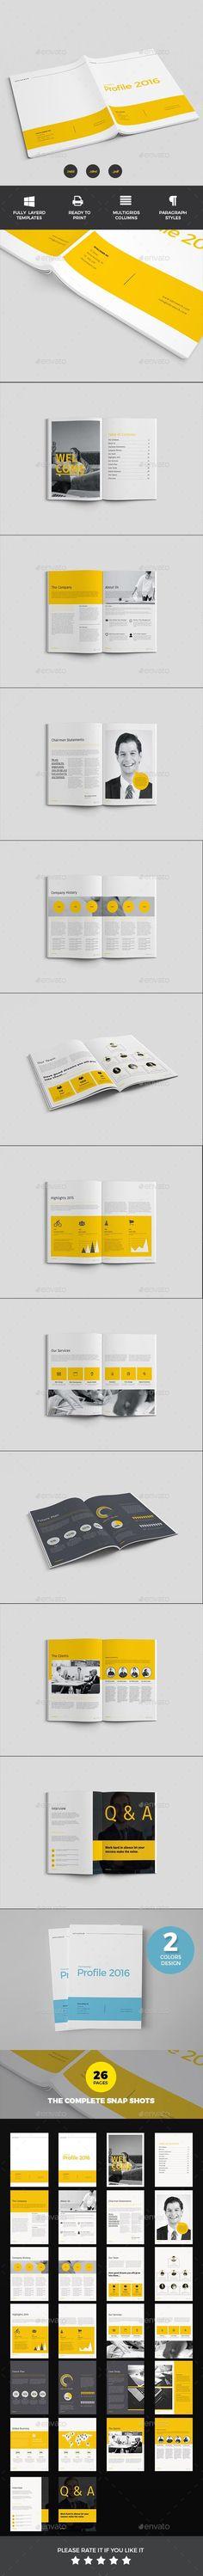 Company Profile  Company Profile Brochures And Photoshop